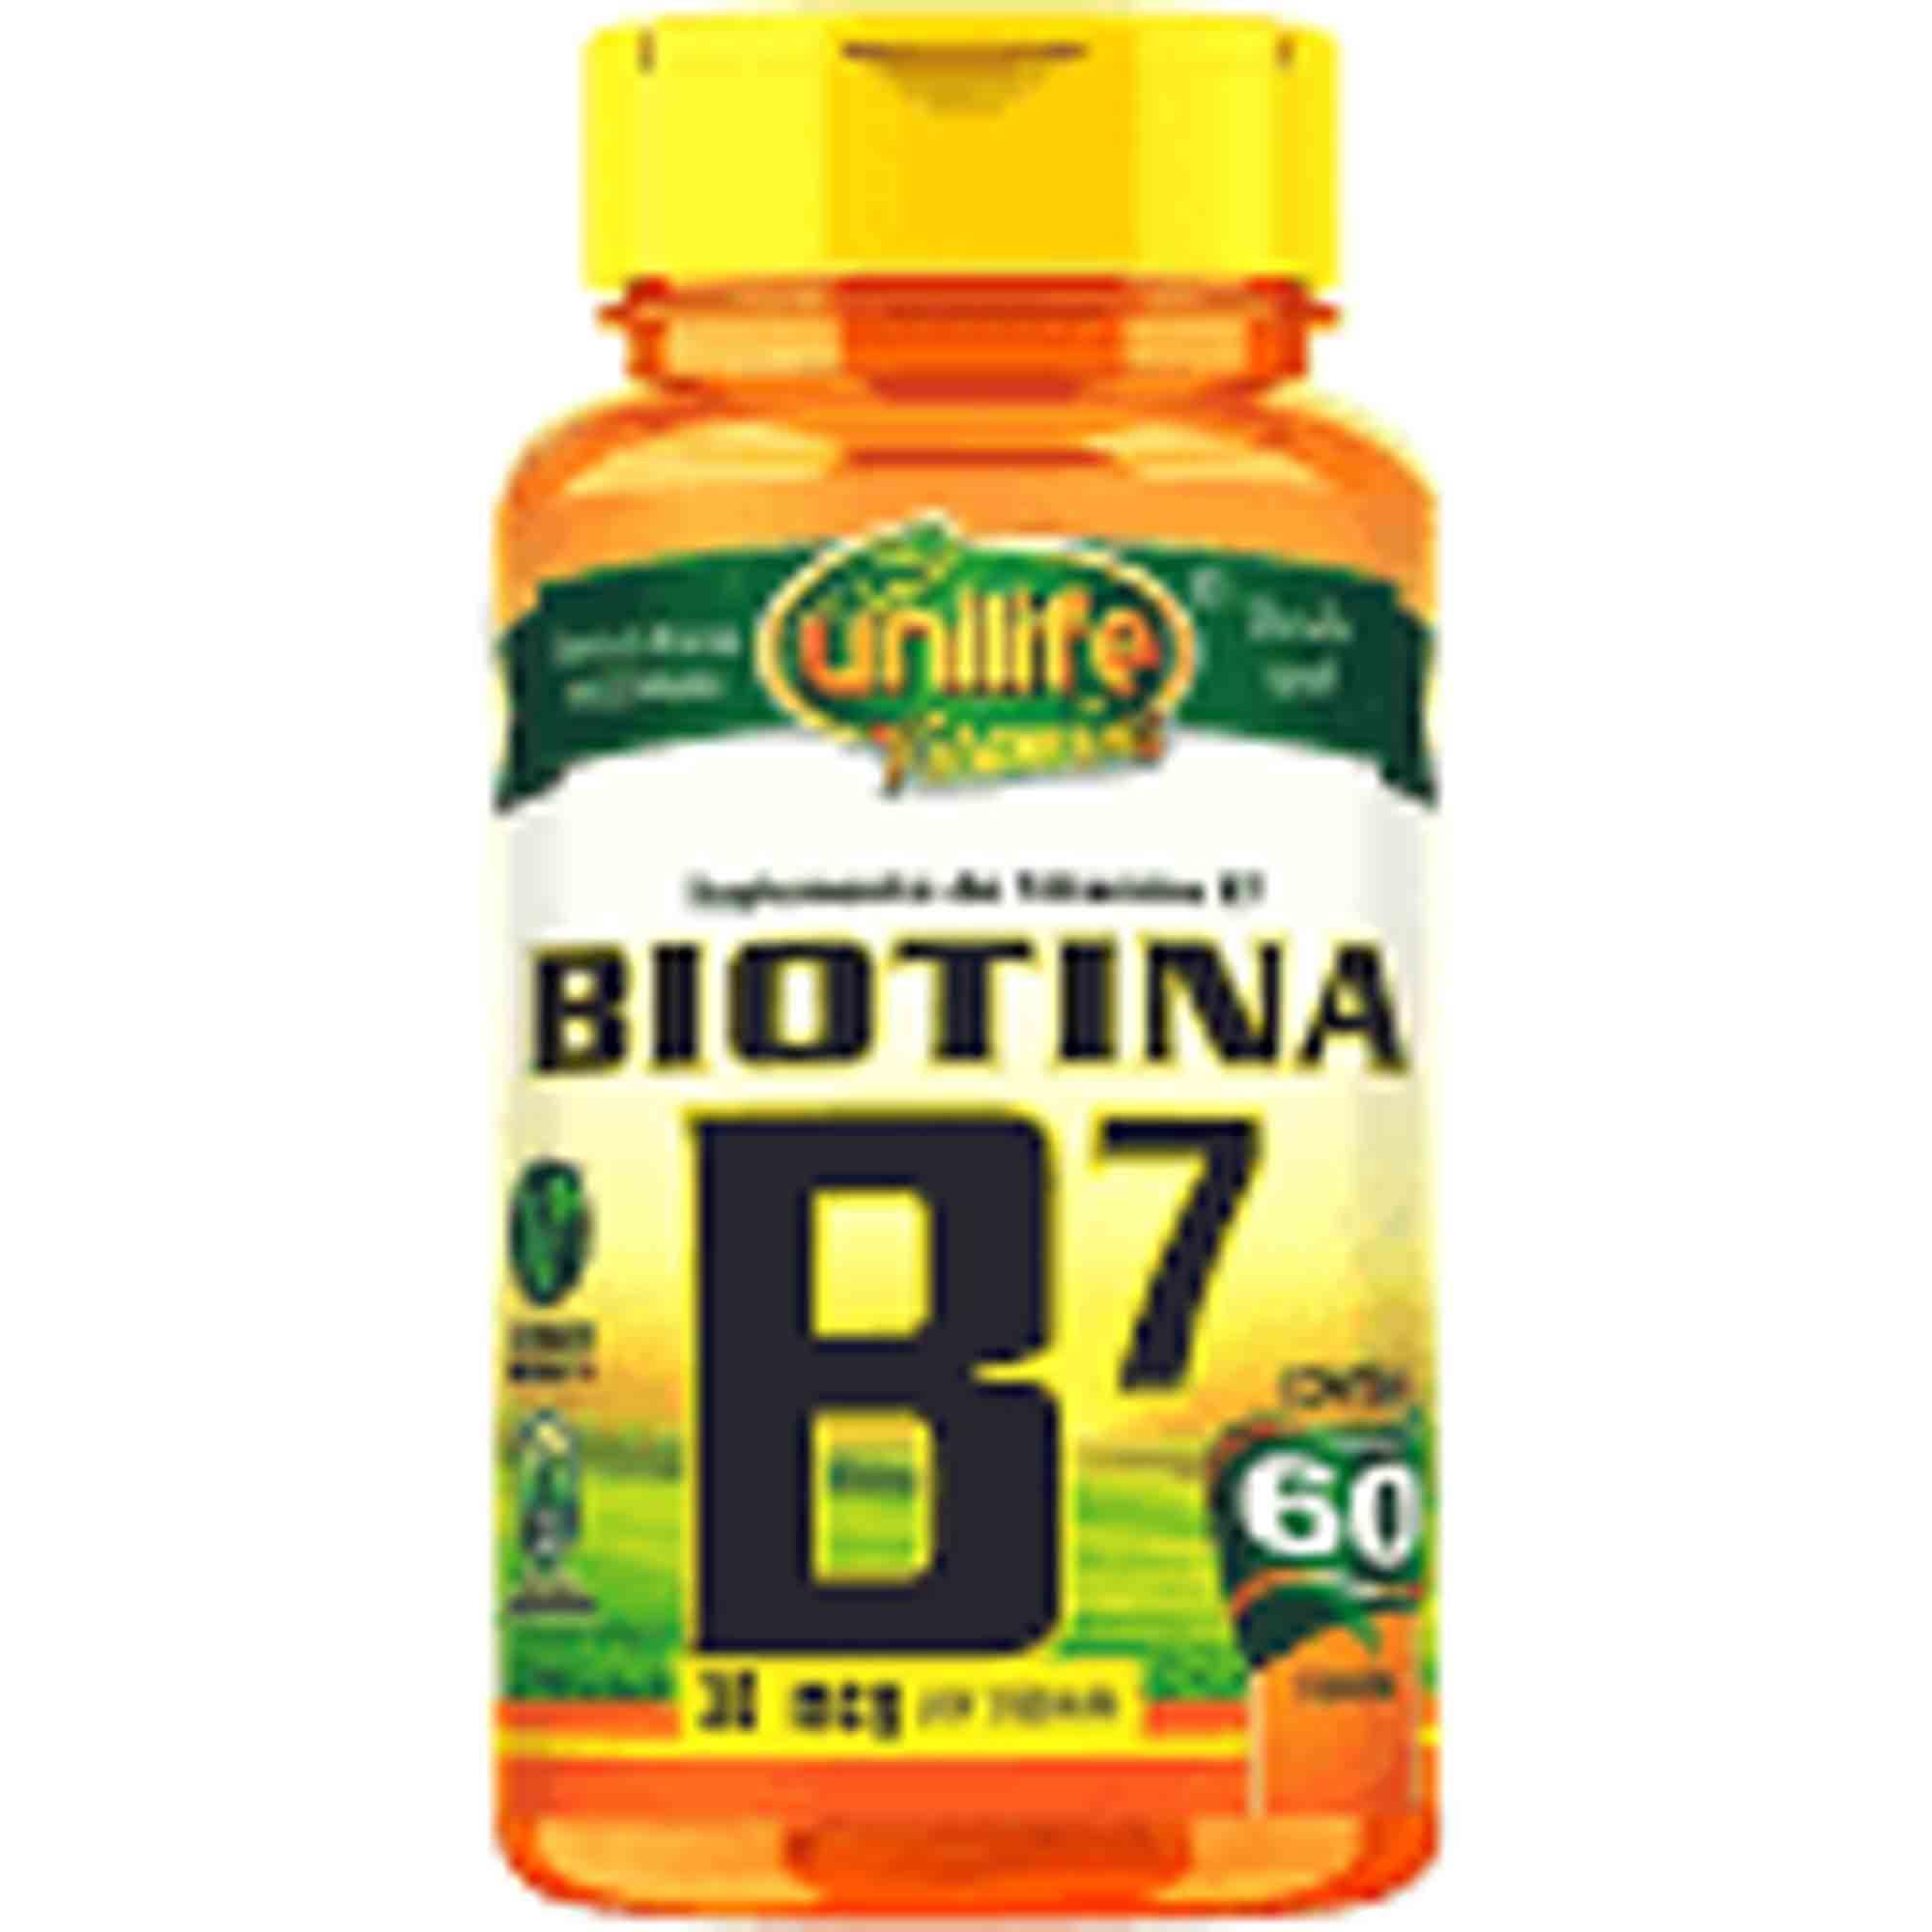 Vitamina (Biotina) B7 60caps 30mcg Unilife